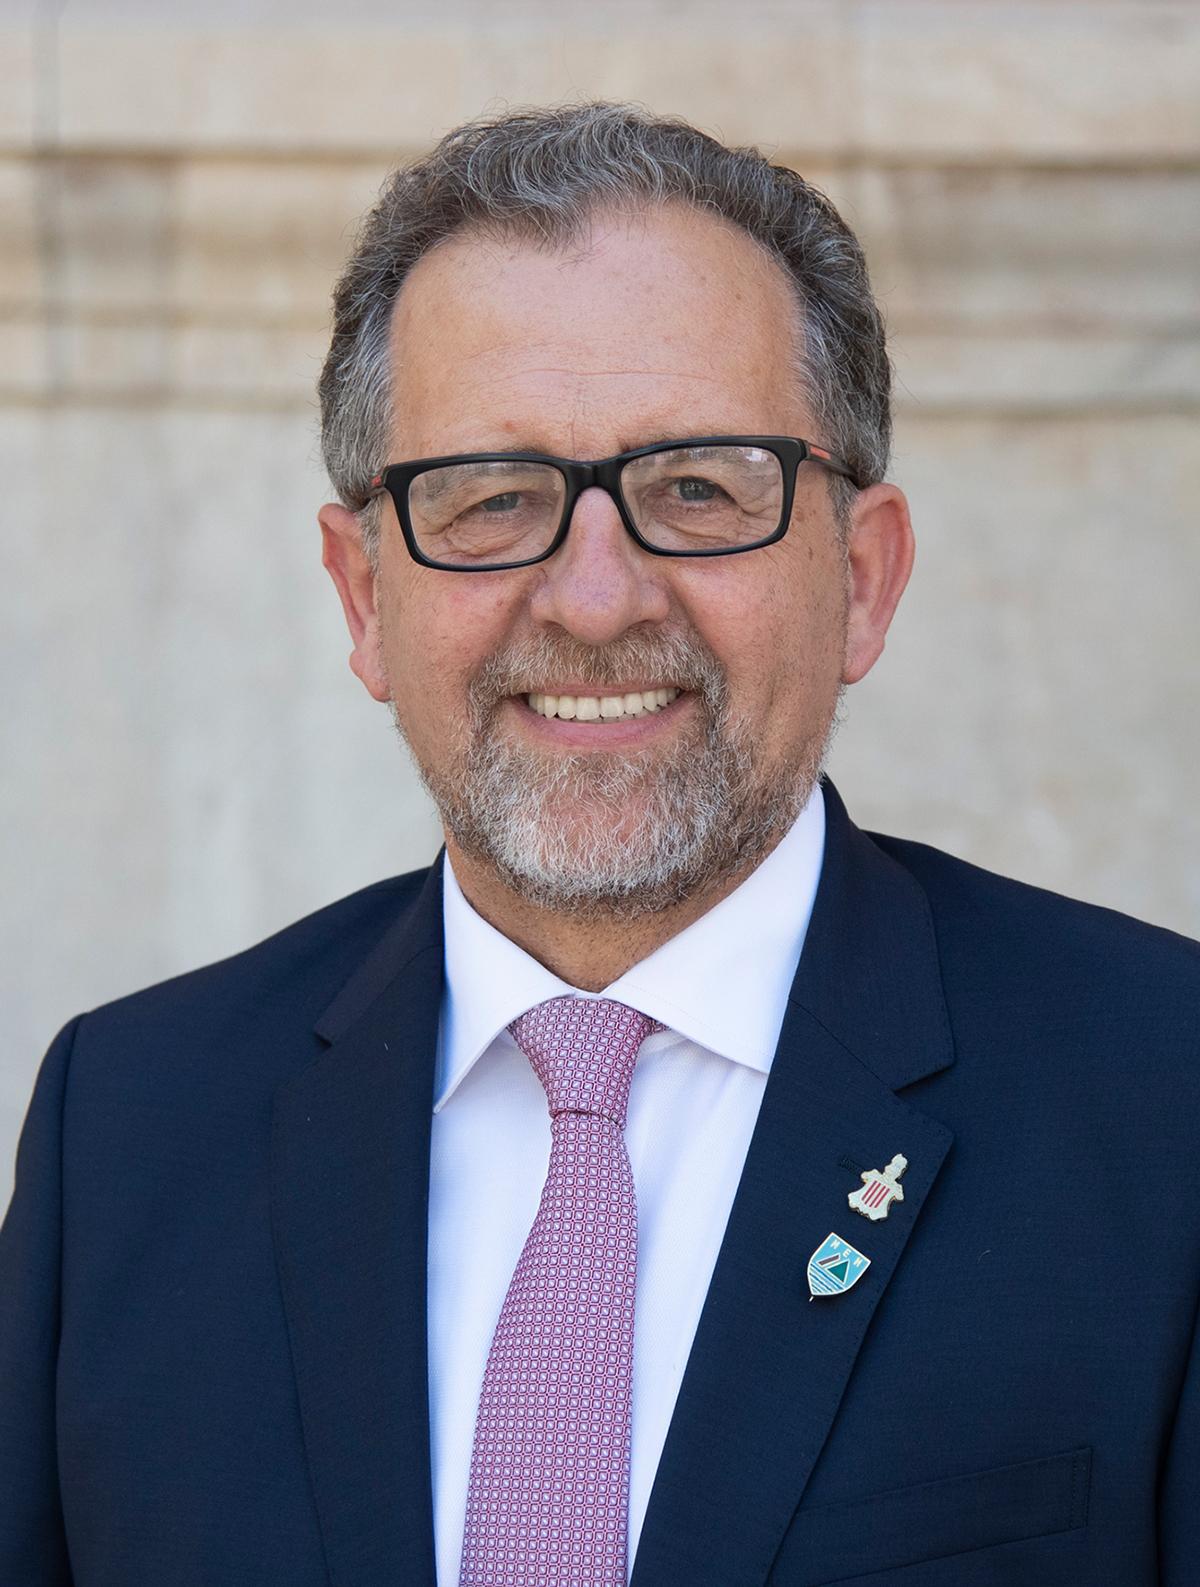 Josep Pascual Martí García